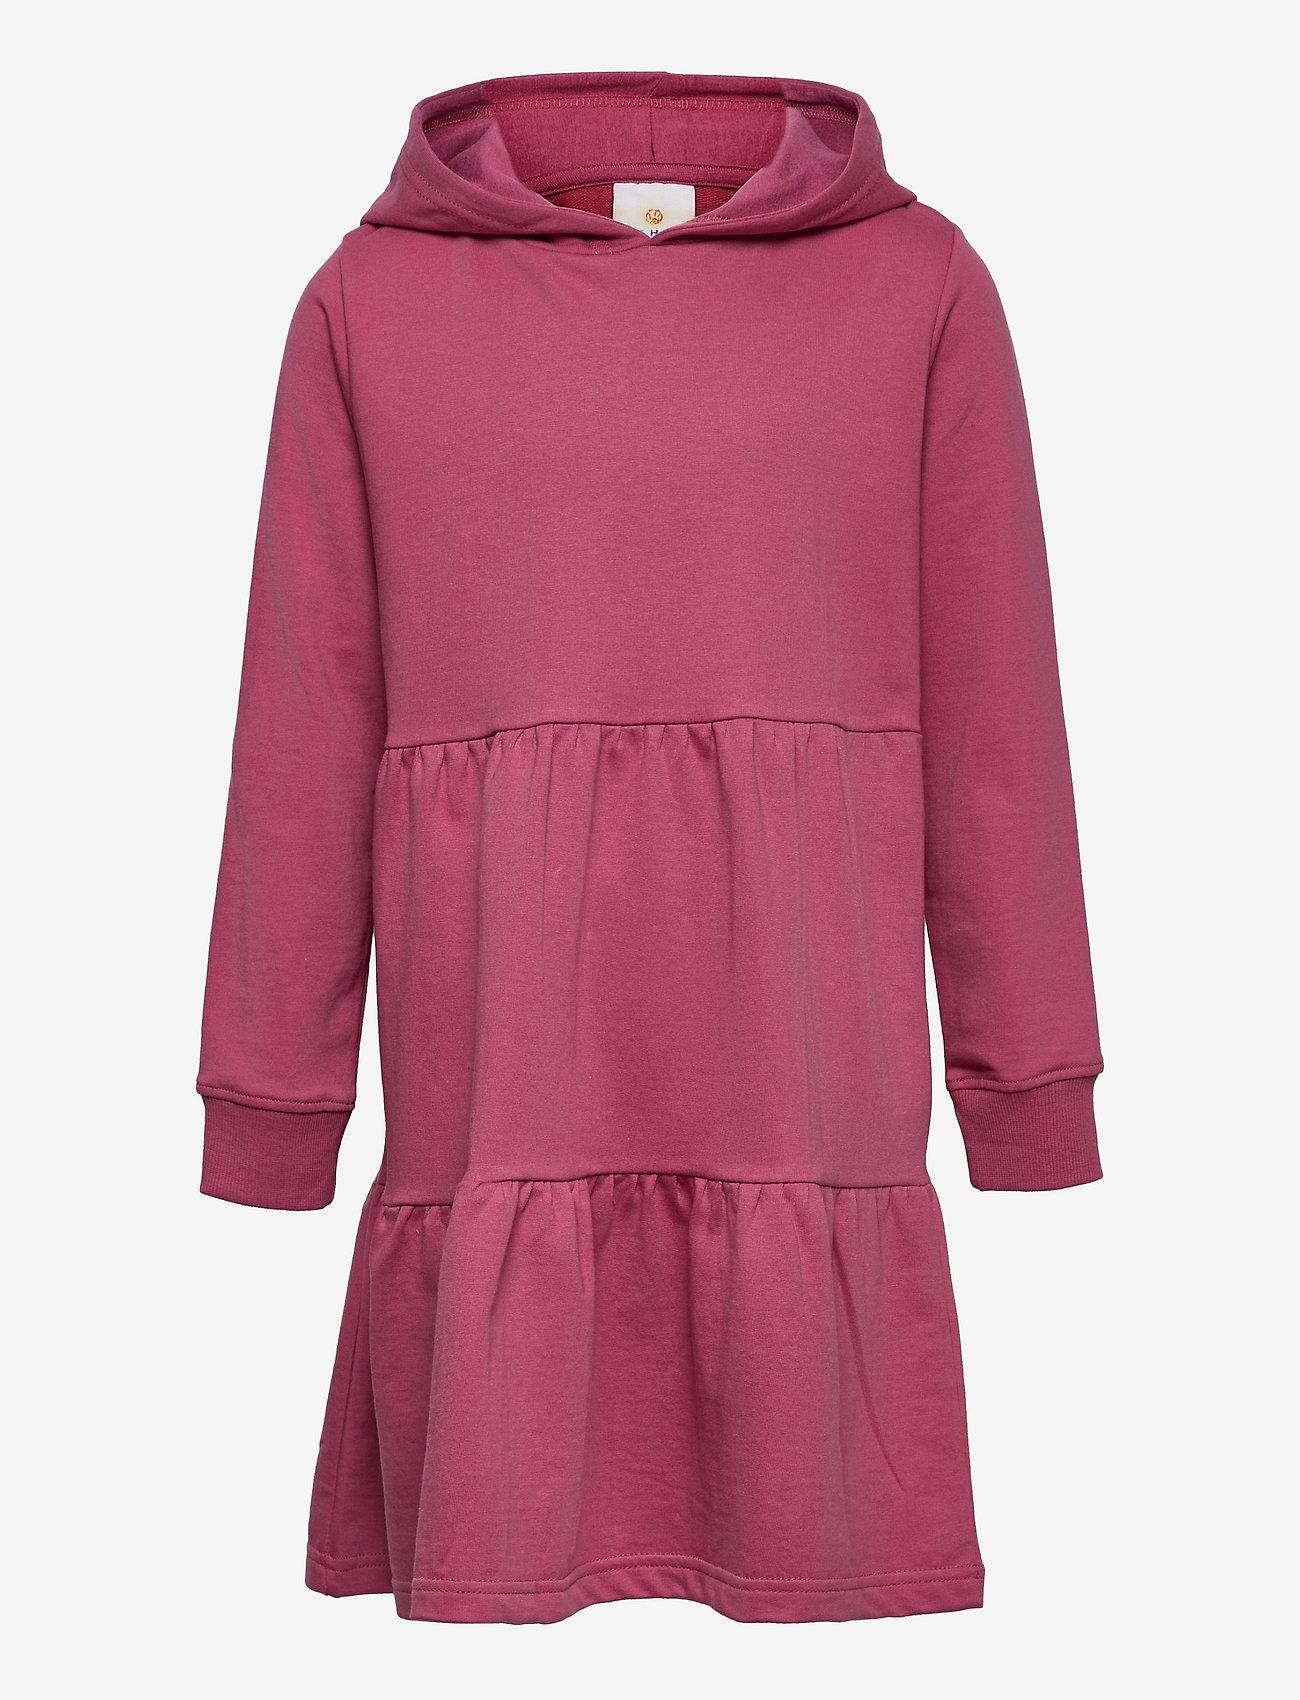 The New - EXIT HOODIE SWEAT DRESS - kjoler & nederdele - heather rose - 0